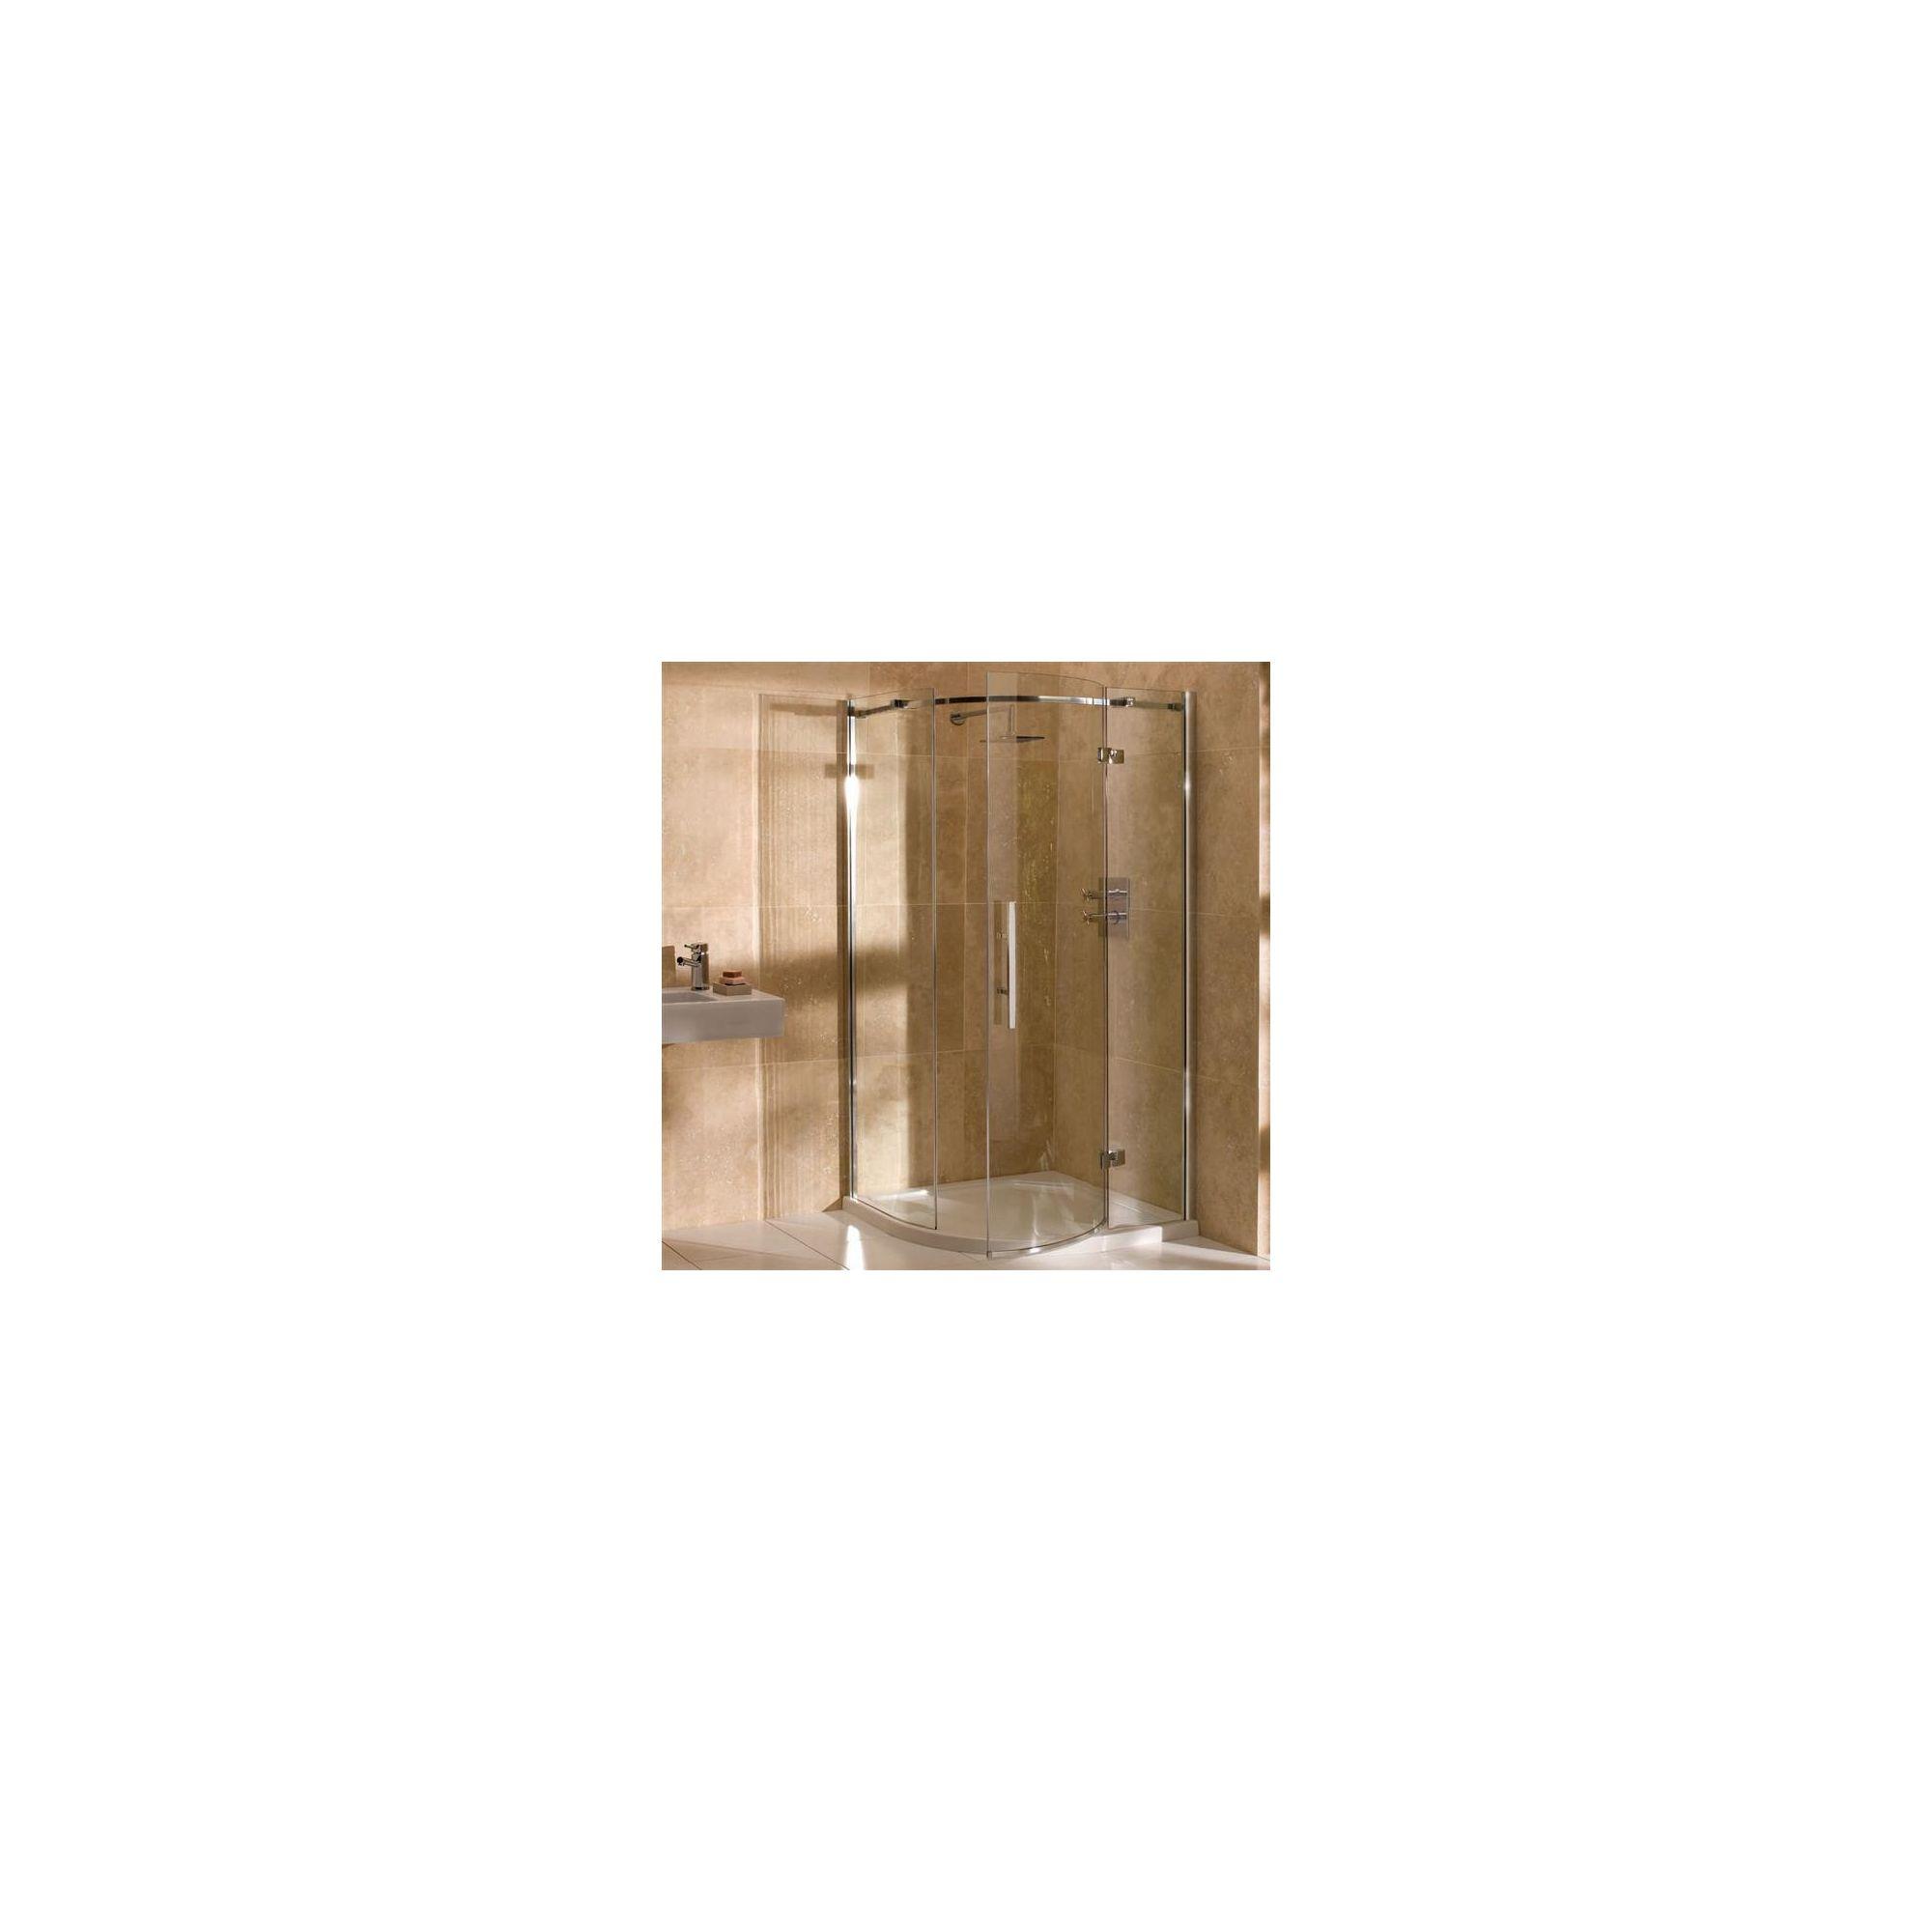 Merlyn Vivid Nine Quadrant Shower Door, 800mm x 800mm, Right Handed, 8mm Glass at Tesco Direct